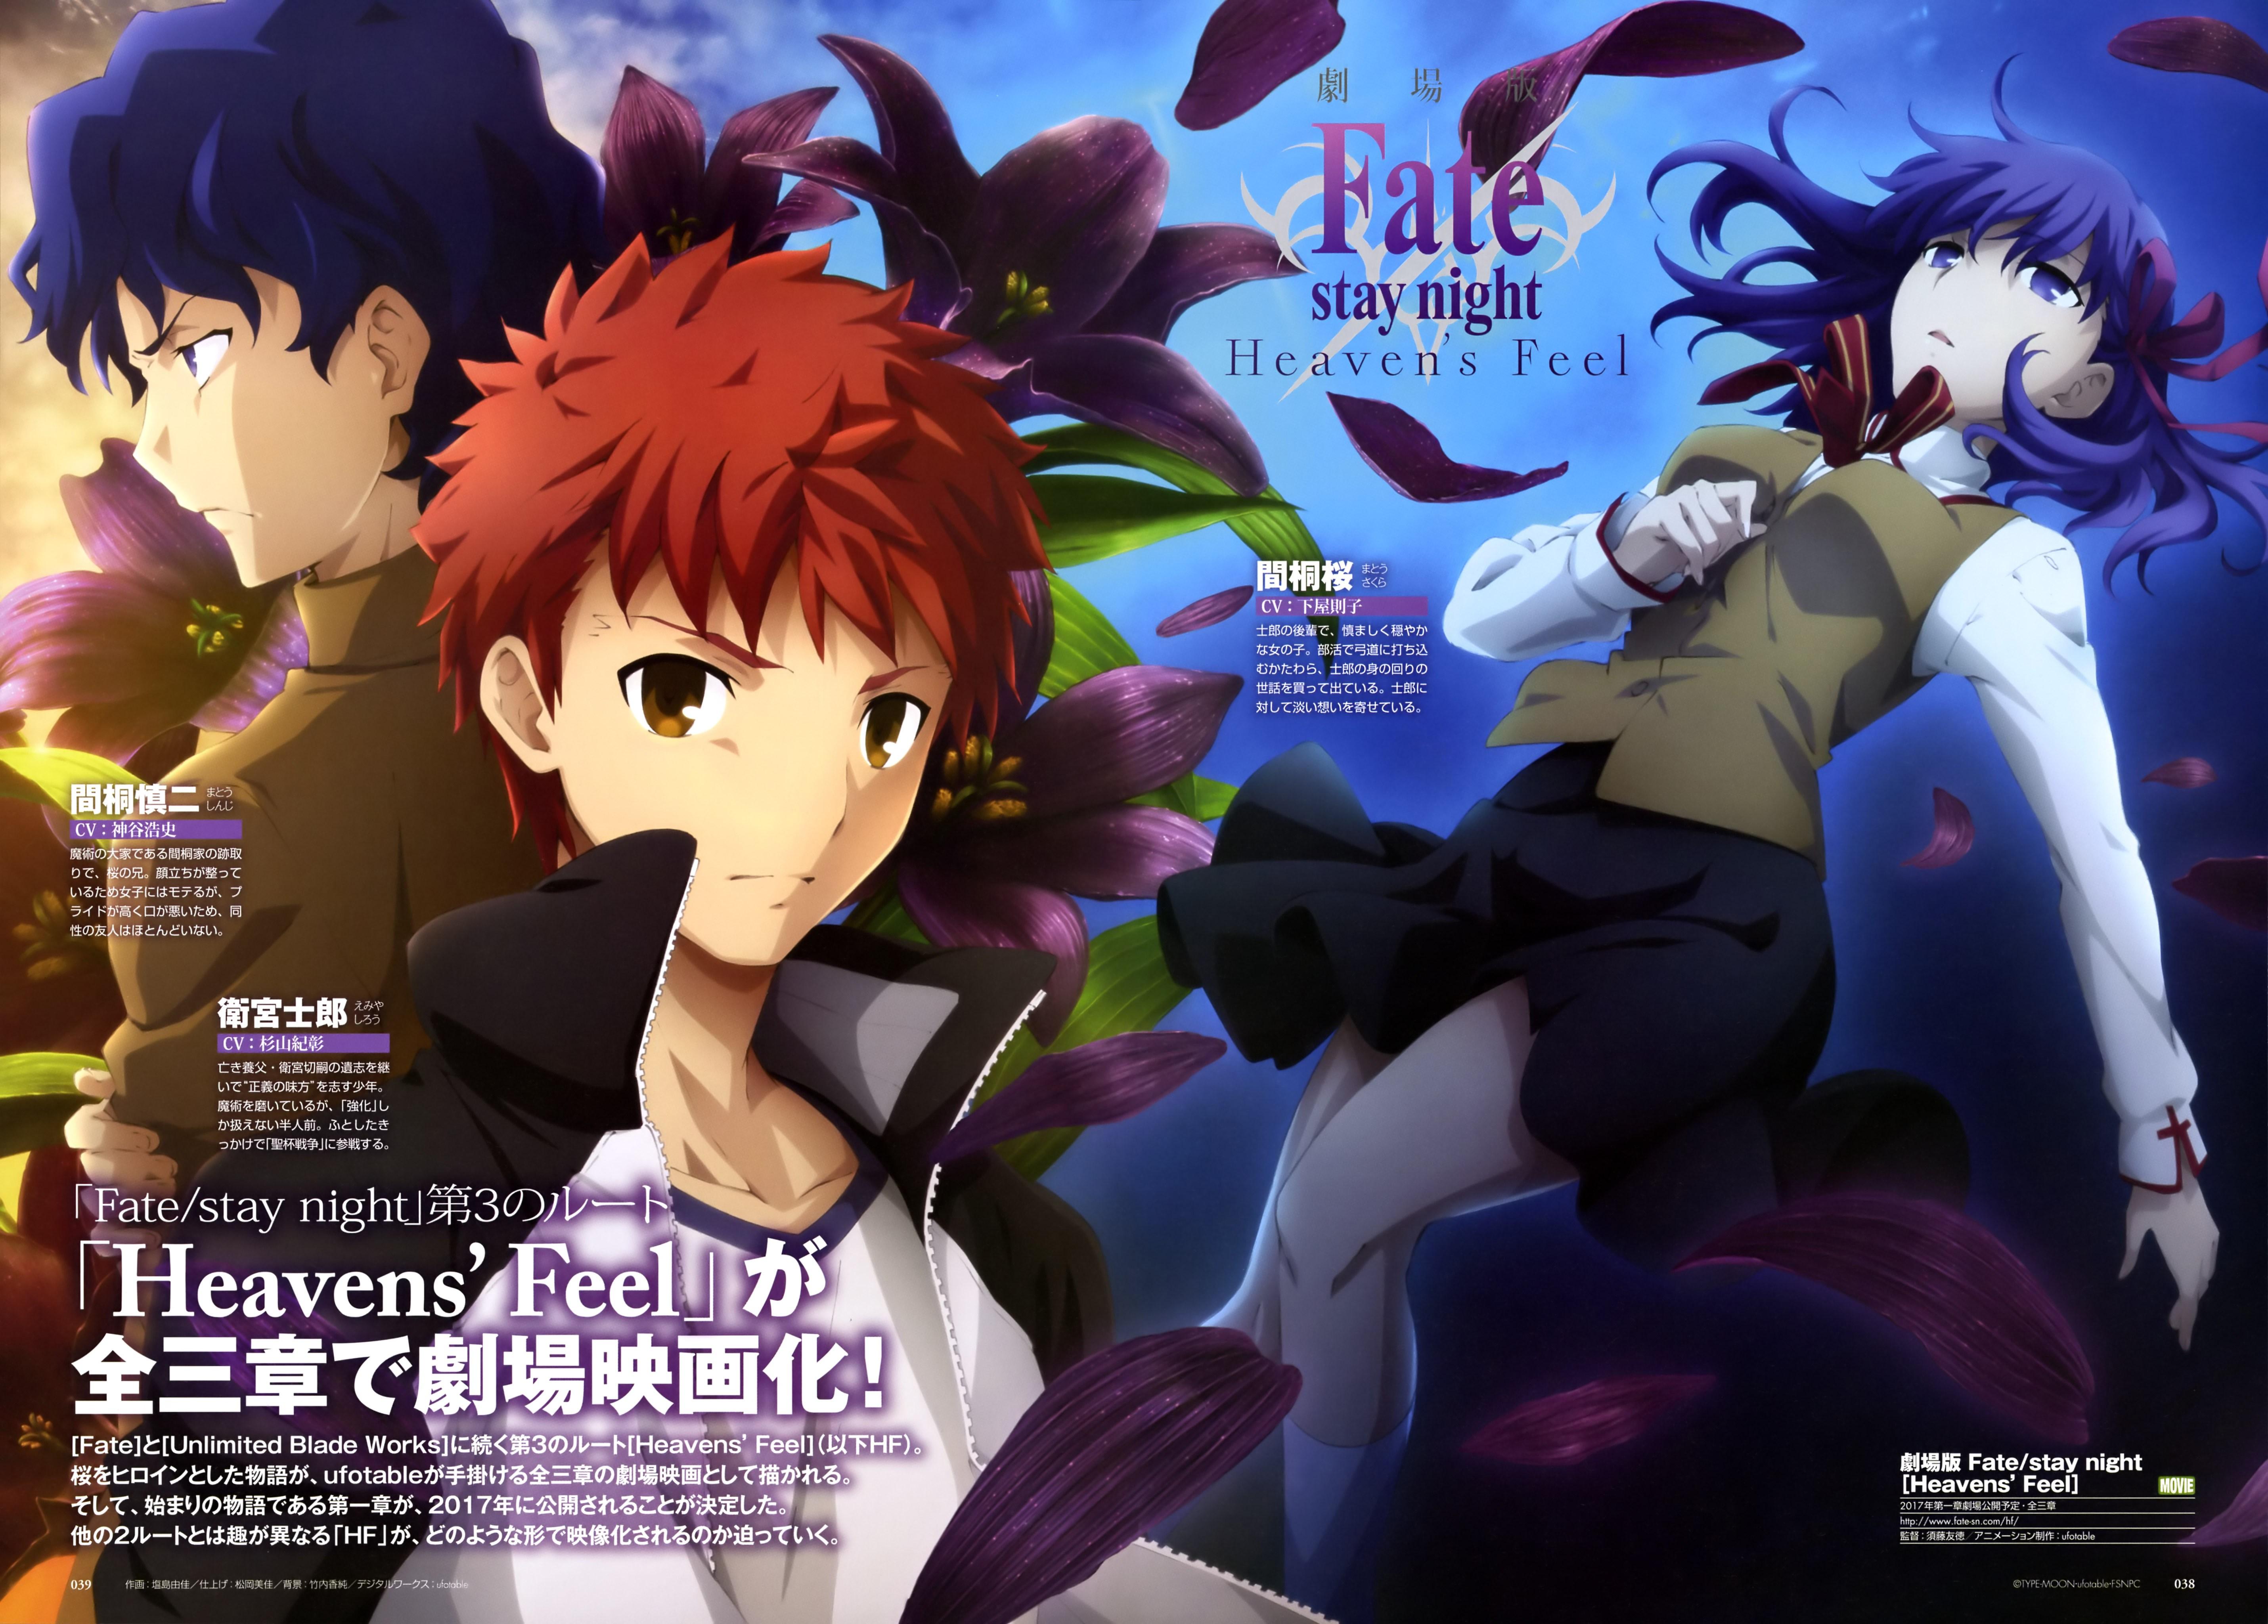 Fate Stay Night Movie Heaven S Feel Wallpapers Anime Hq Fate Stay Night Movie Heaven S Feel Pictures 4k Wallpapers 2019